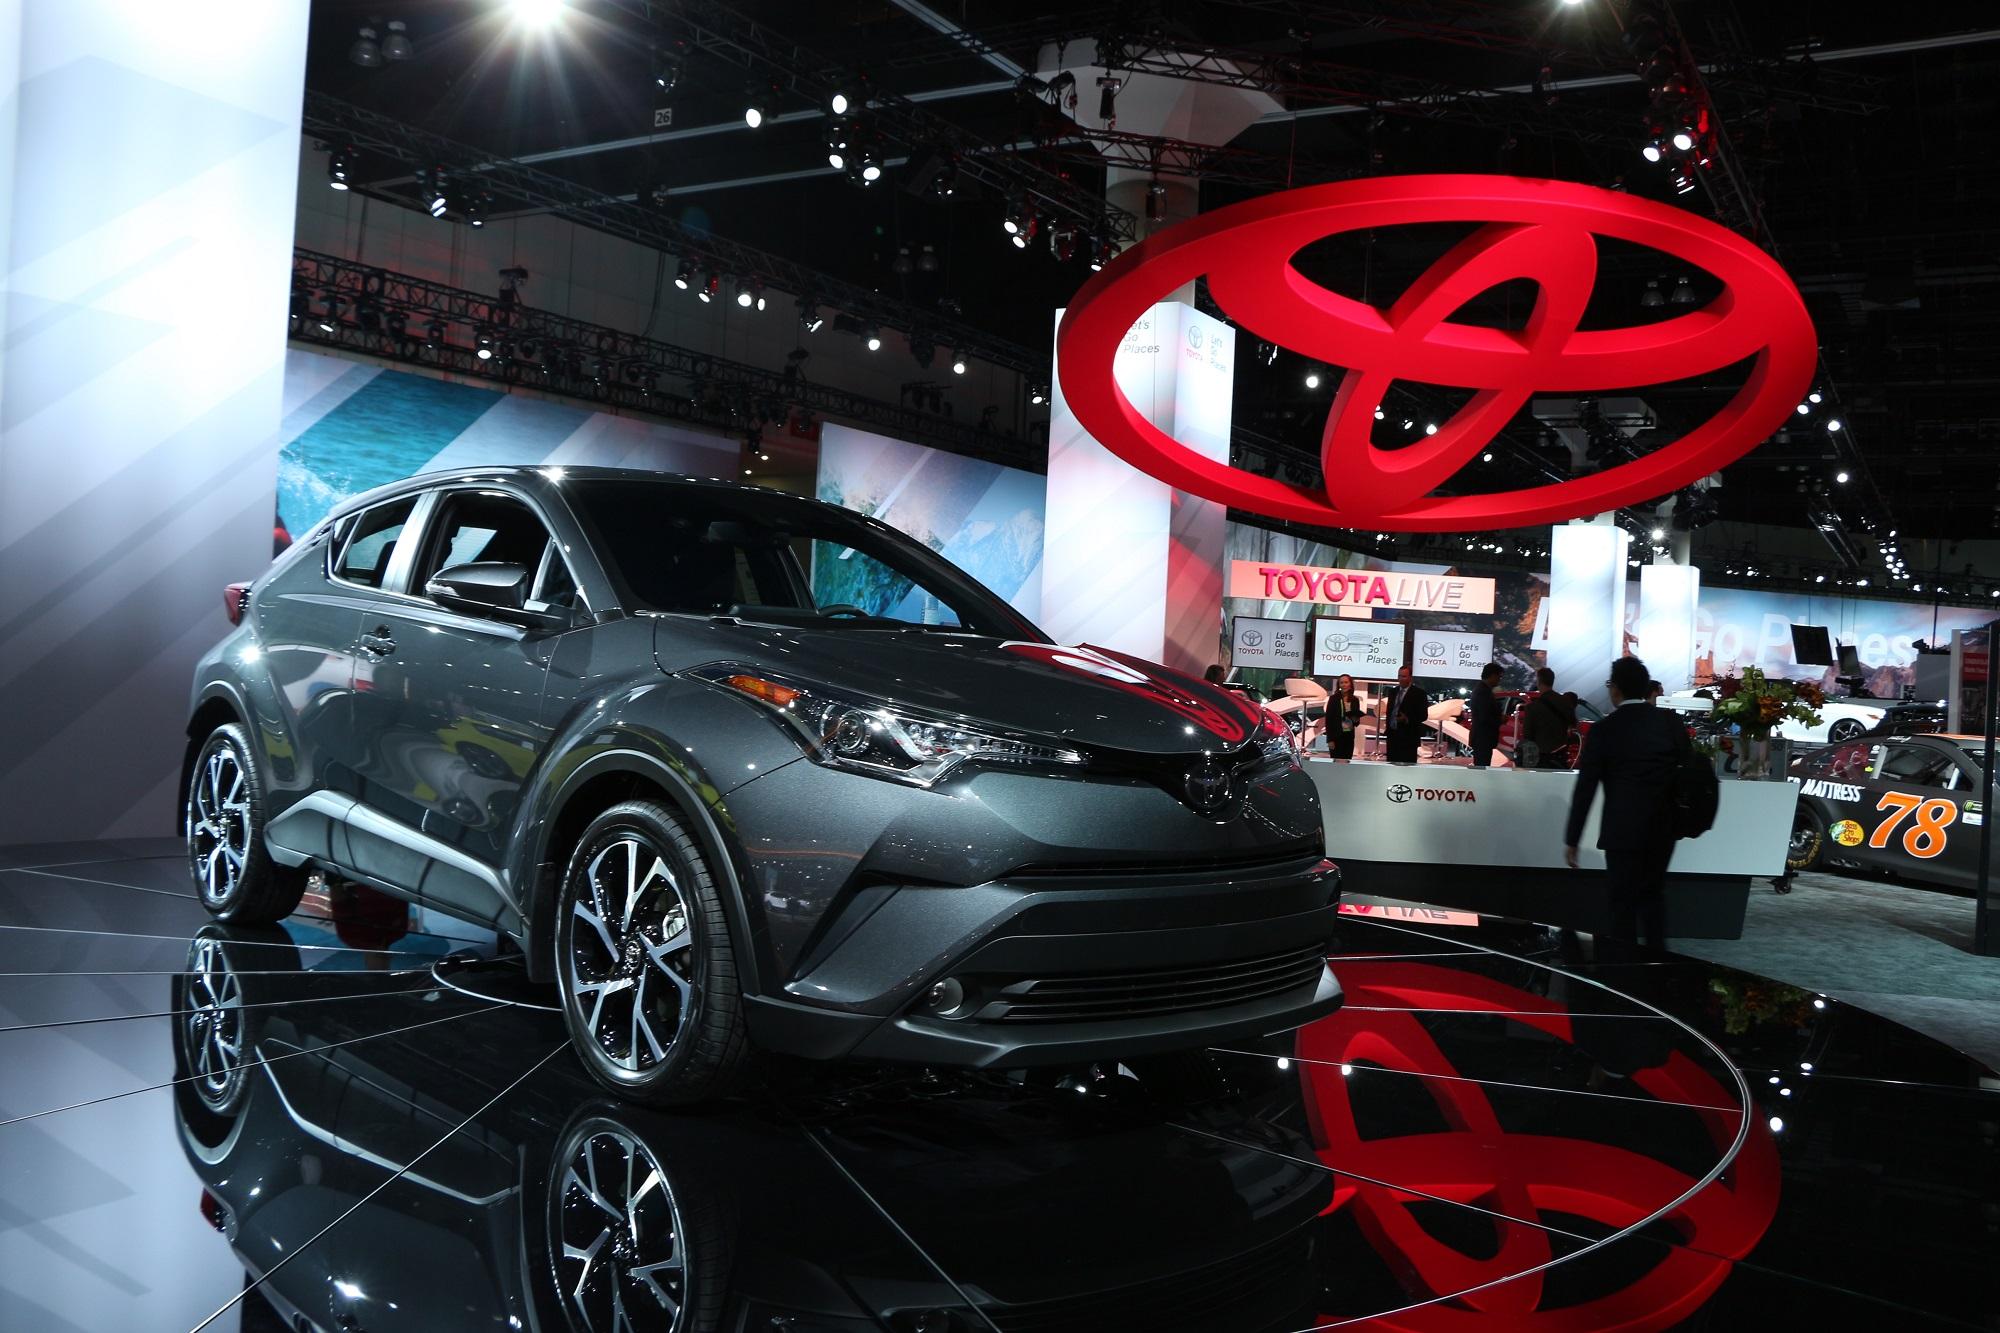 scionlife.com 2017 2018 Toyota C-HR CHR Compact SUV CUV LA Los Angeles Auto Show